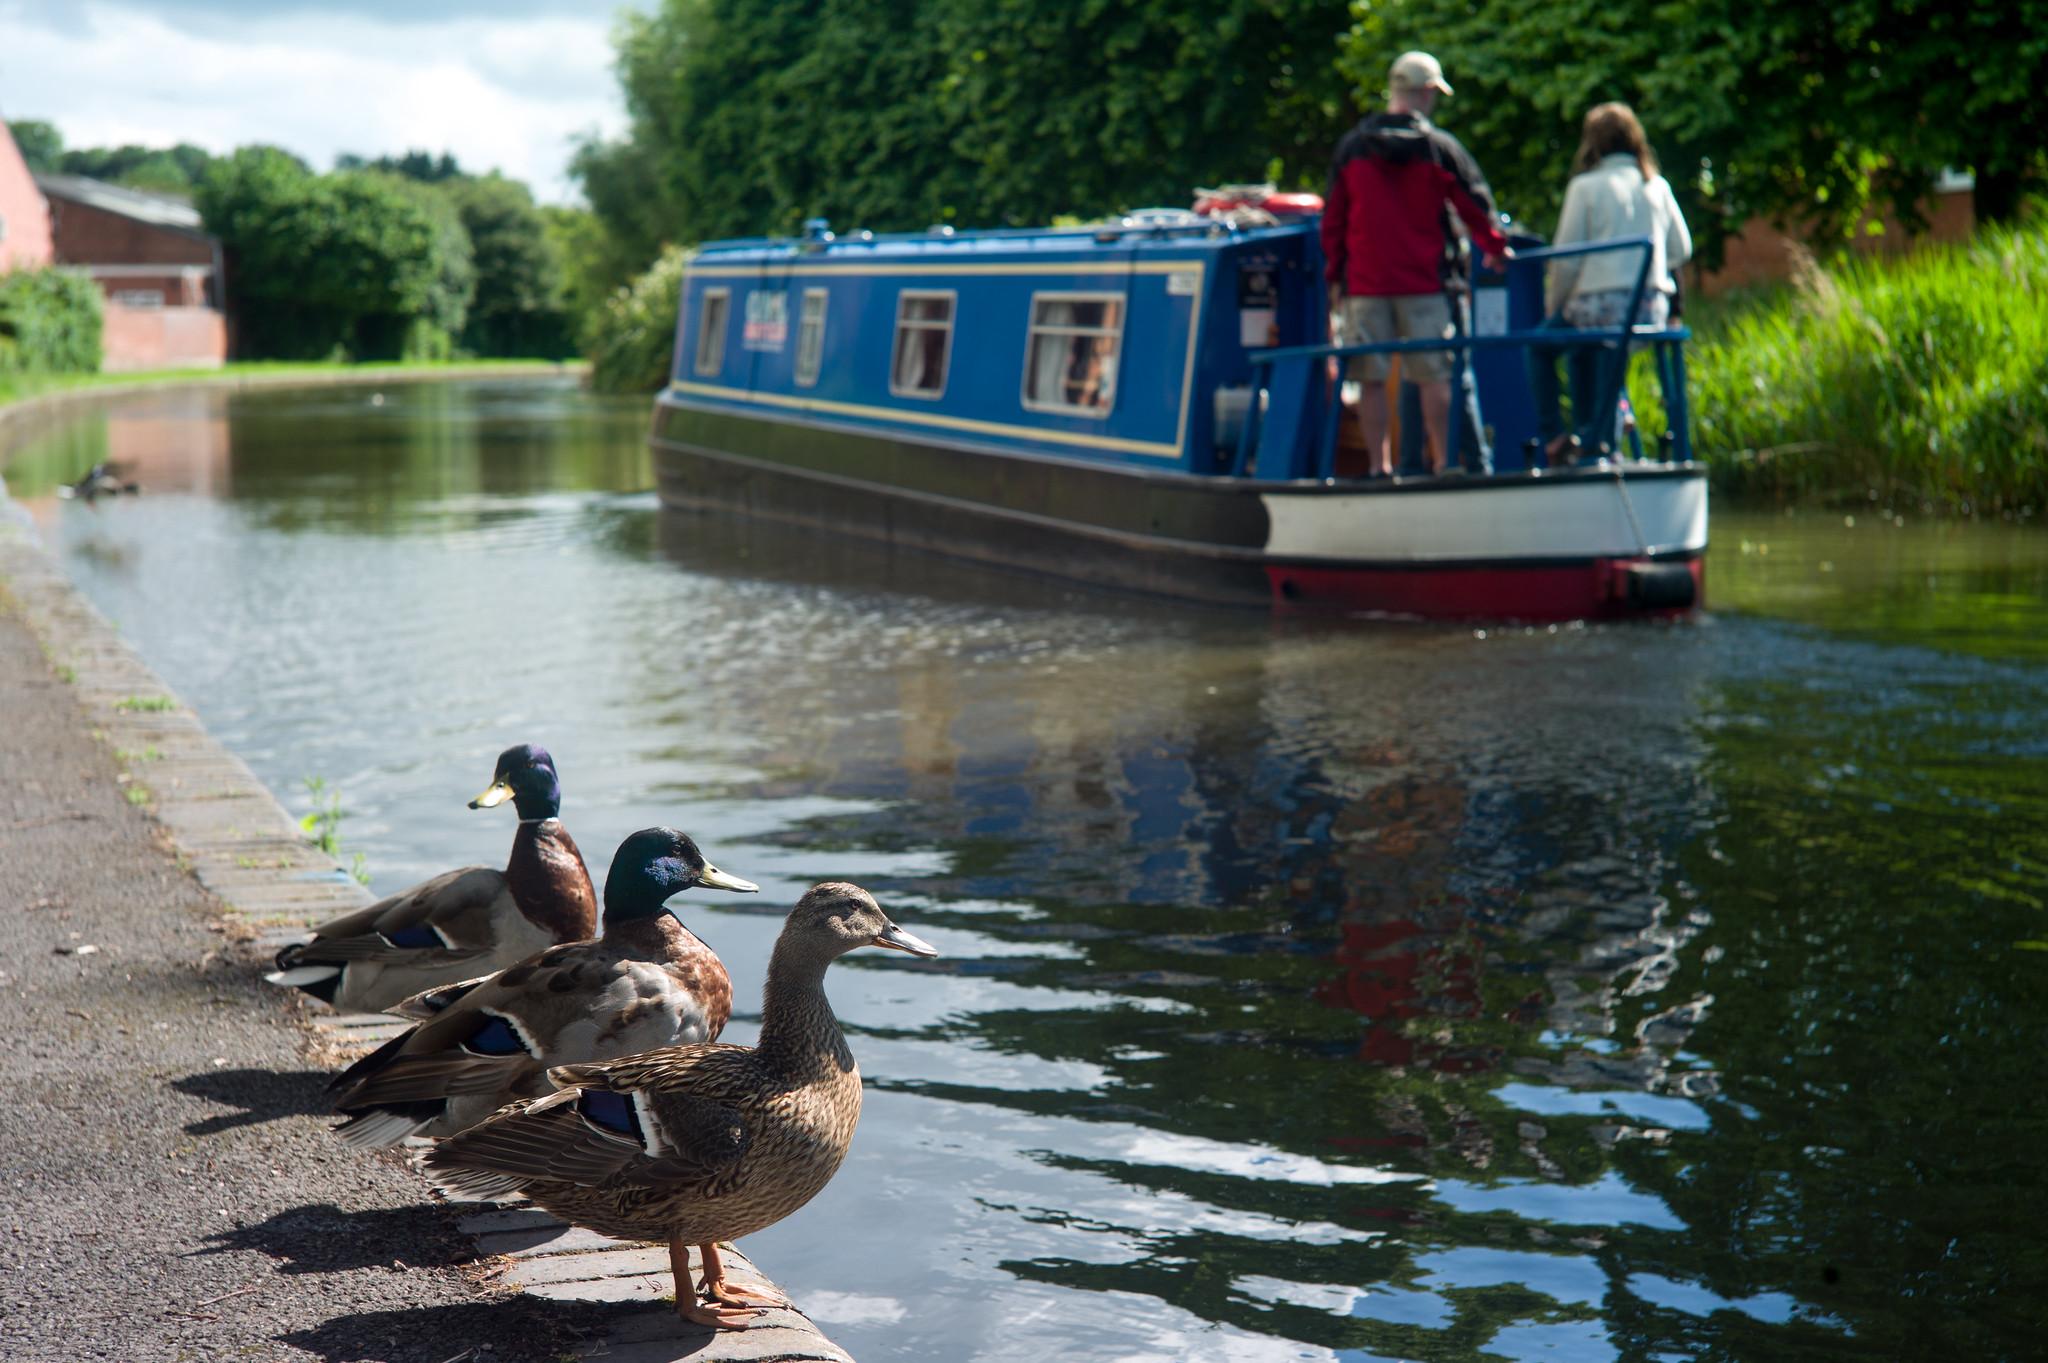 Ducks & Boat